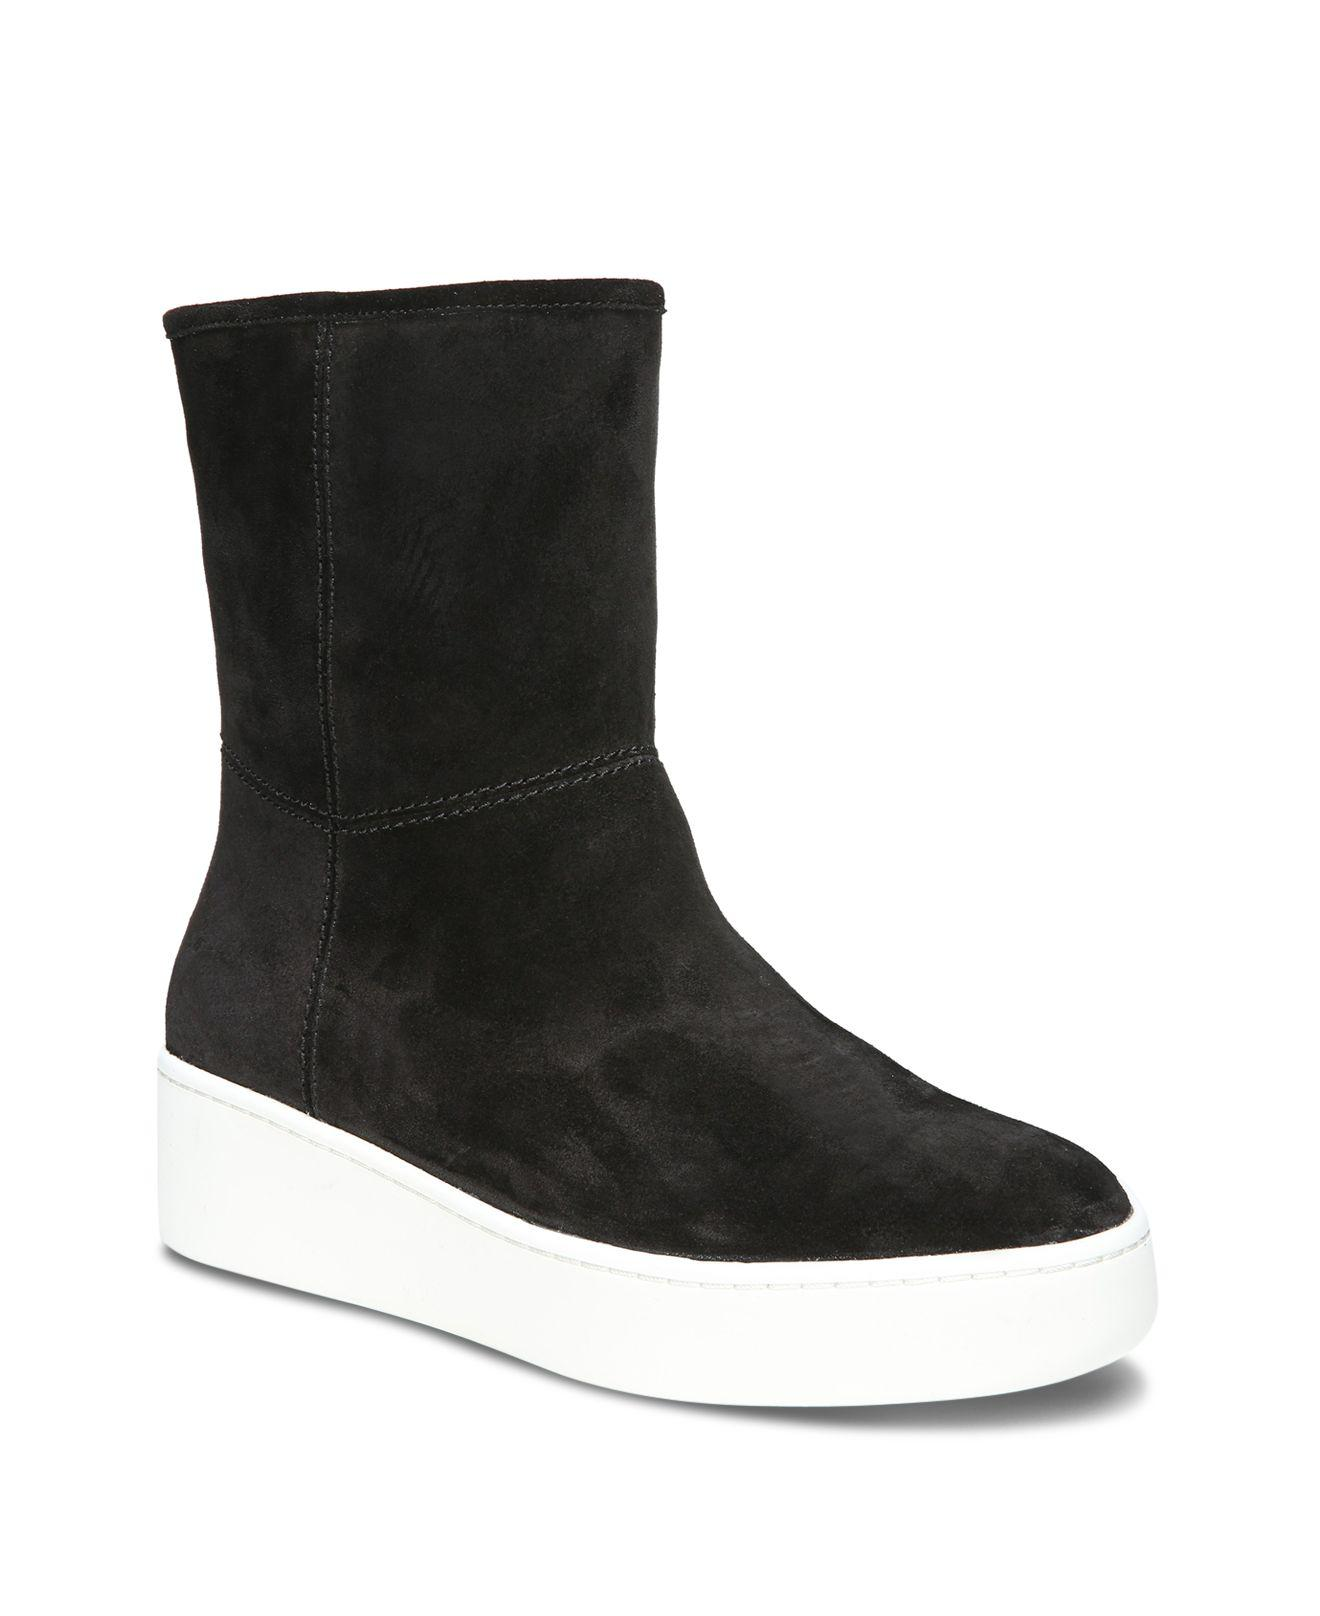 Via Spiga Women's Elona Suede & Fur Platform Sneaker Boots OzqVg4